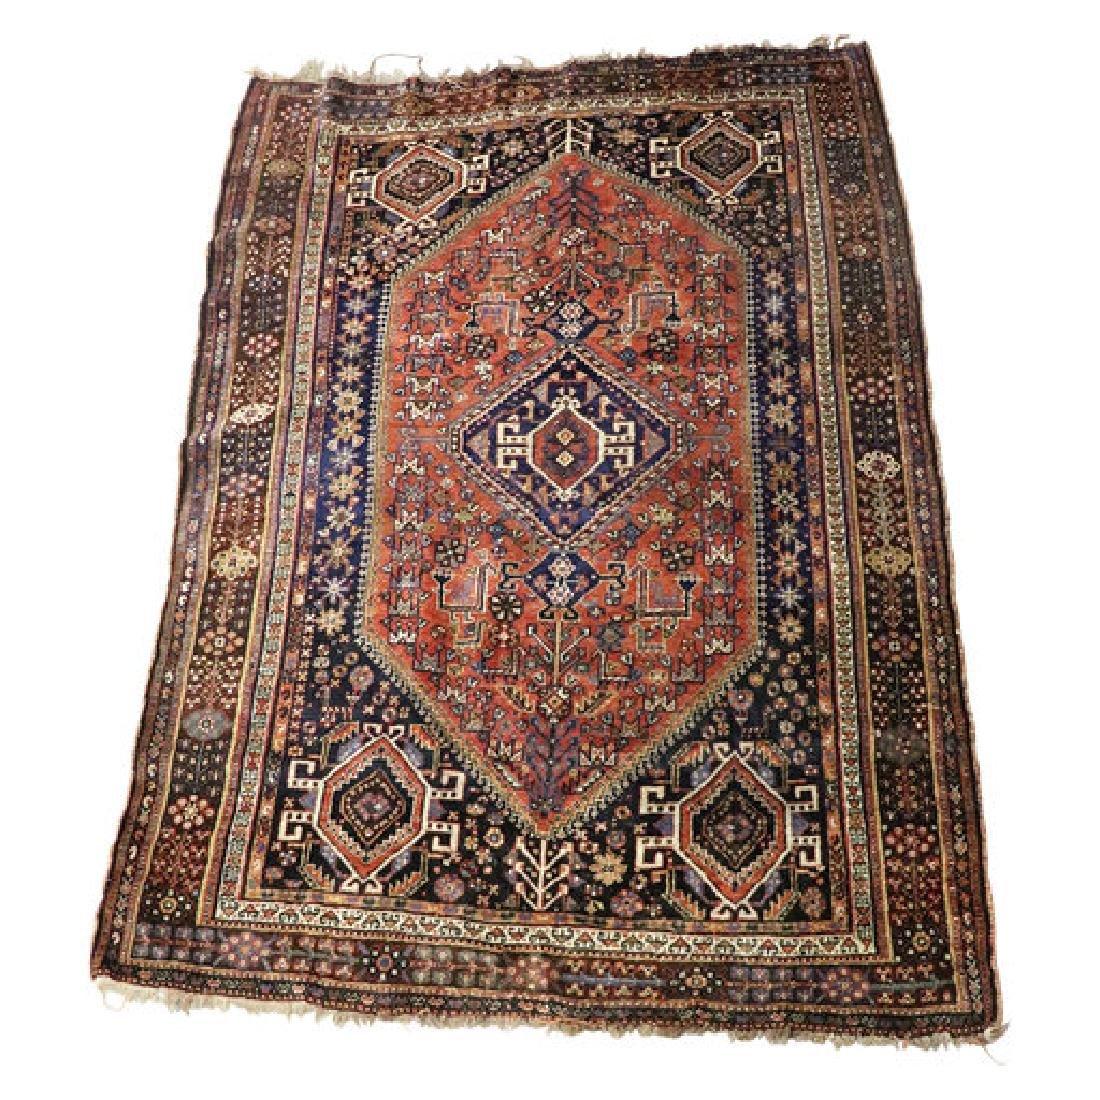 Large Turkish Room Size Carpet Rug